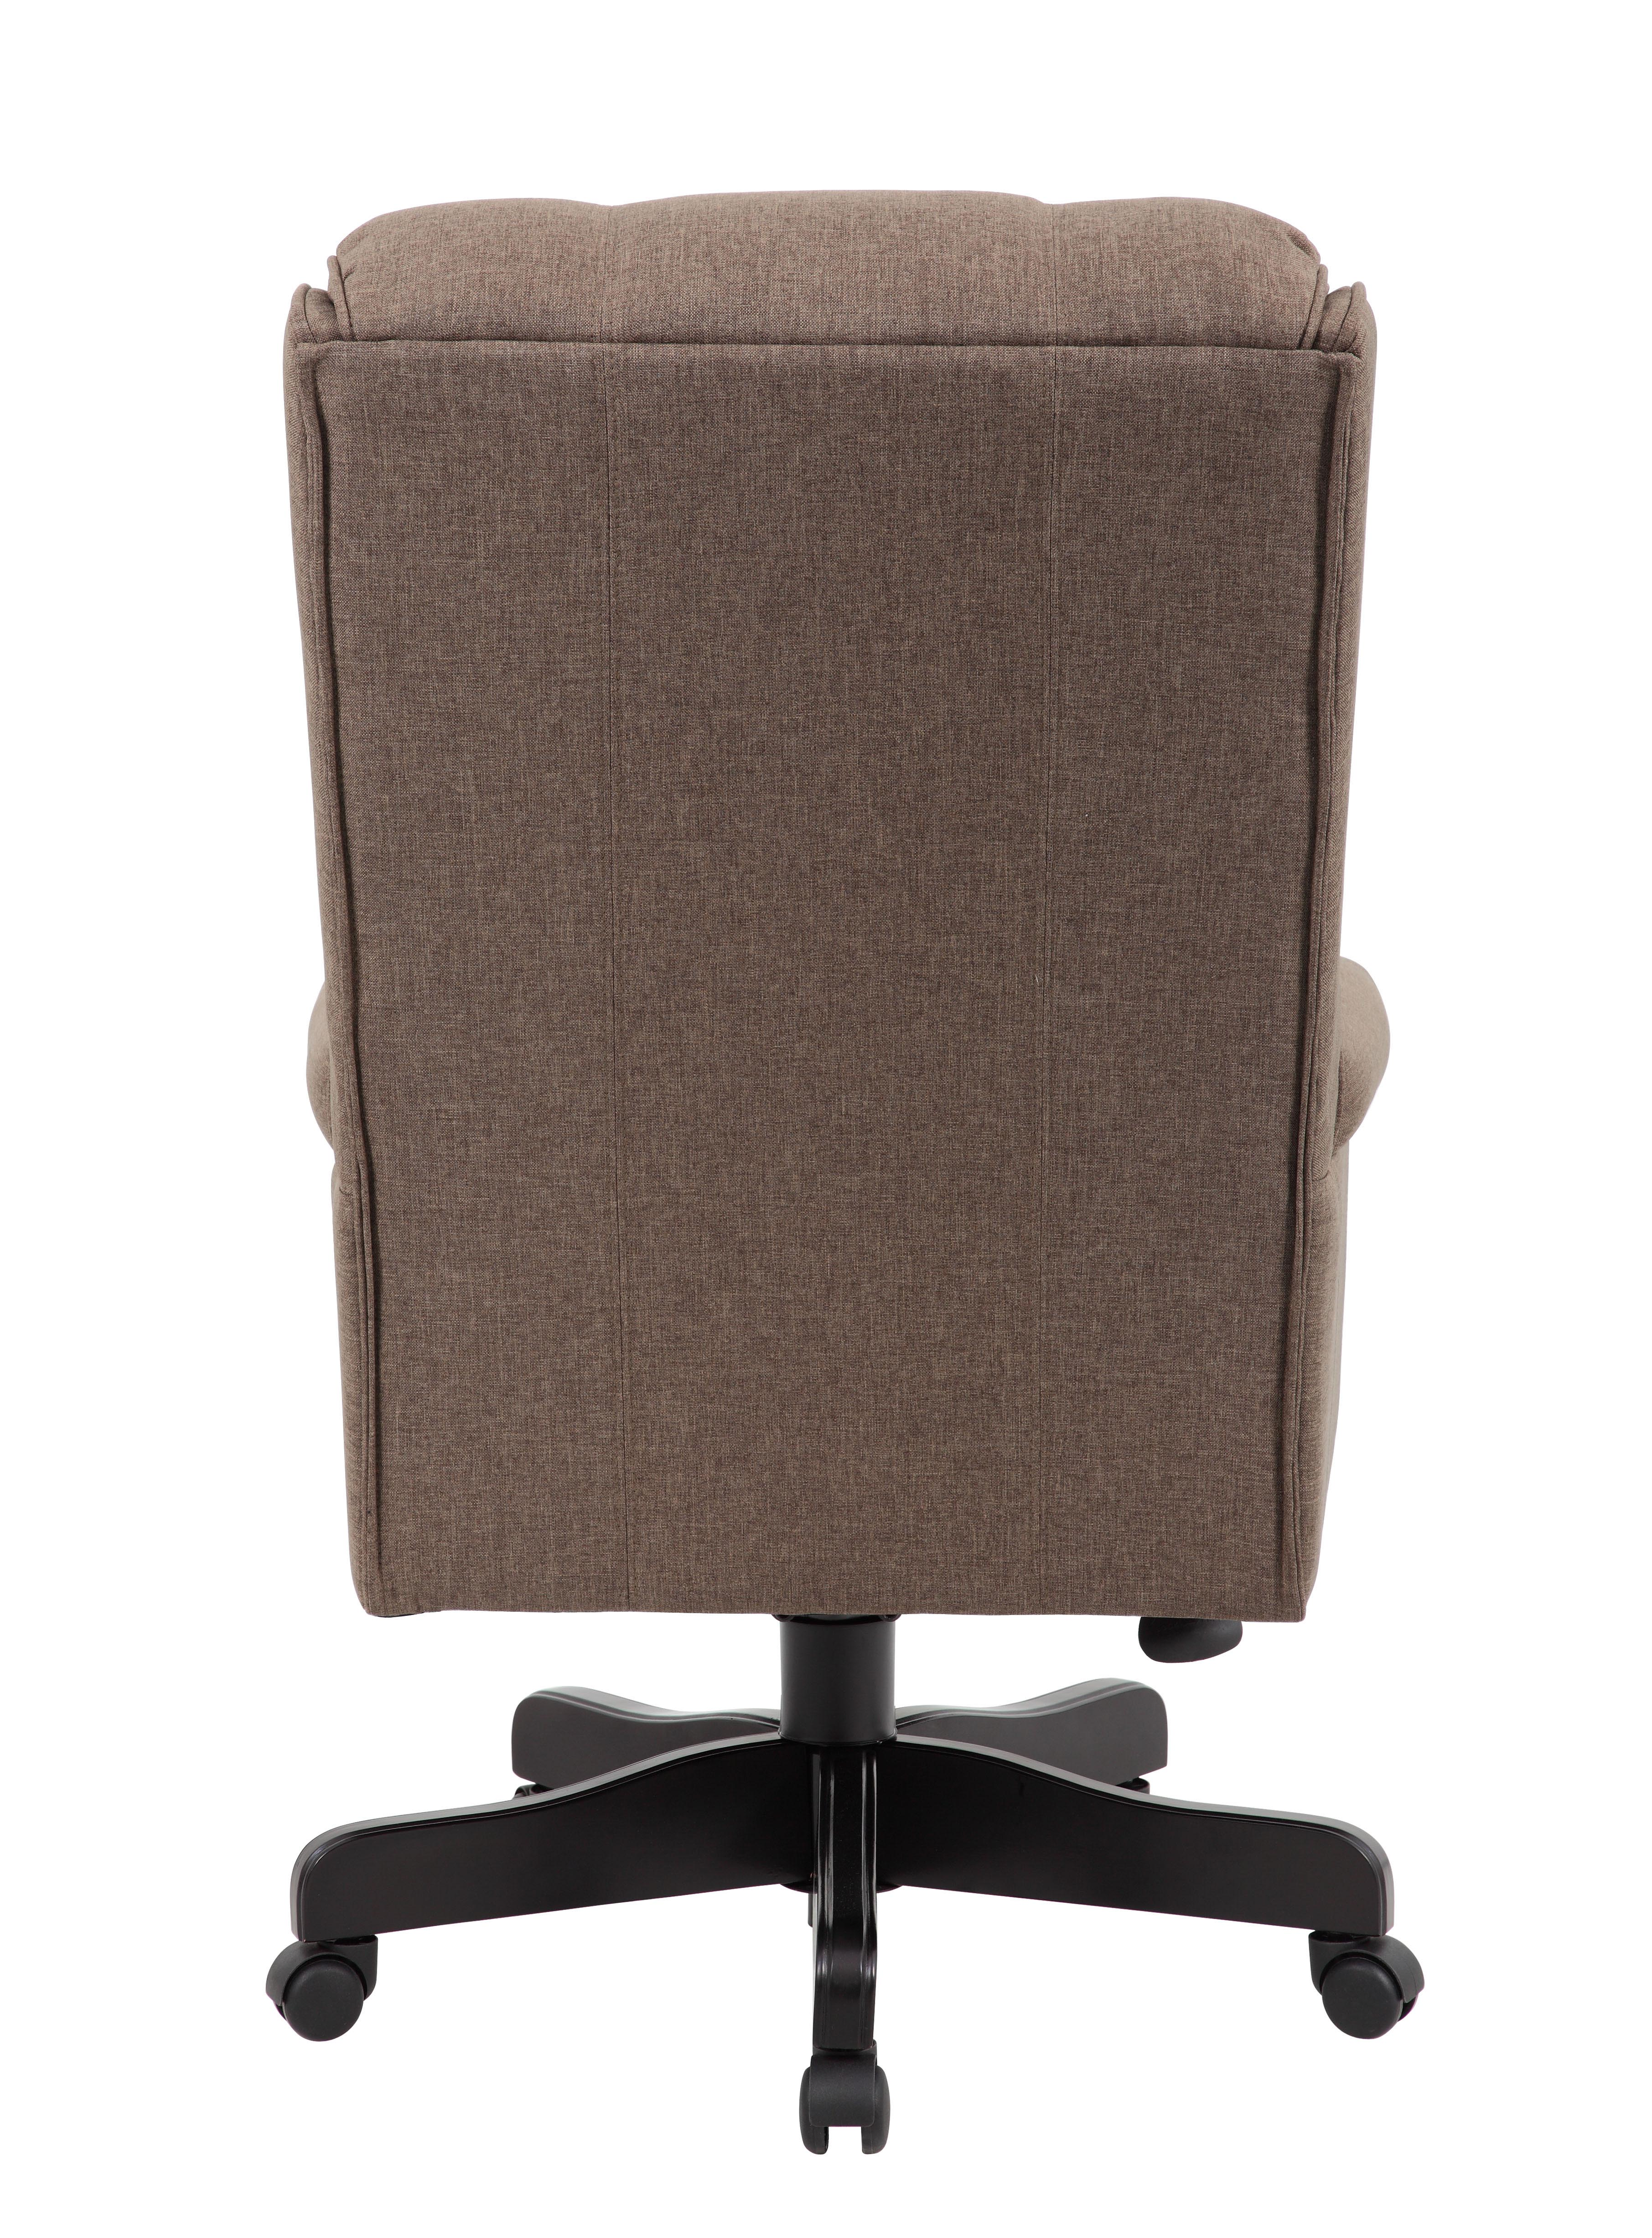 boss high back commercial grade linen chair with black base b980bk